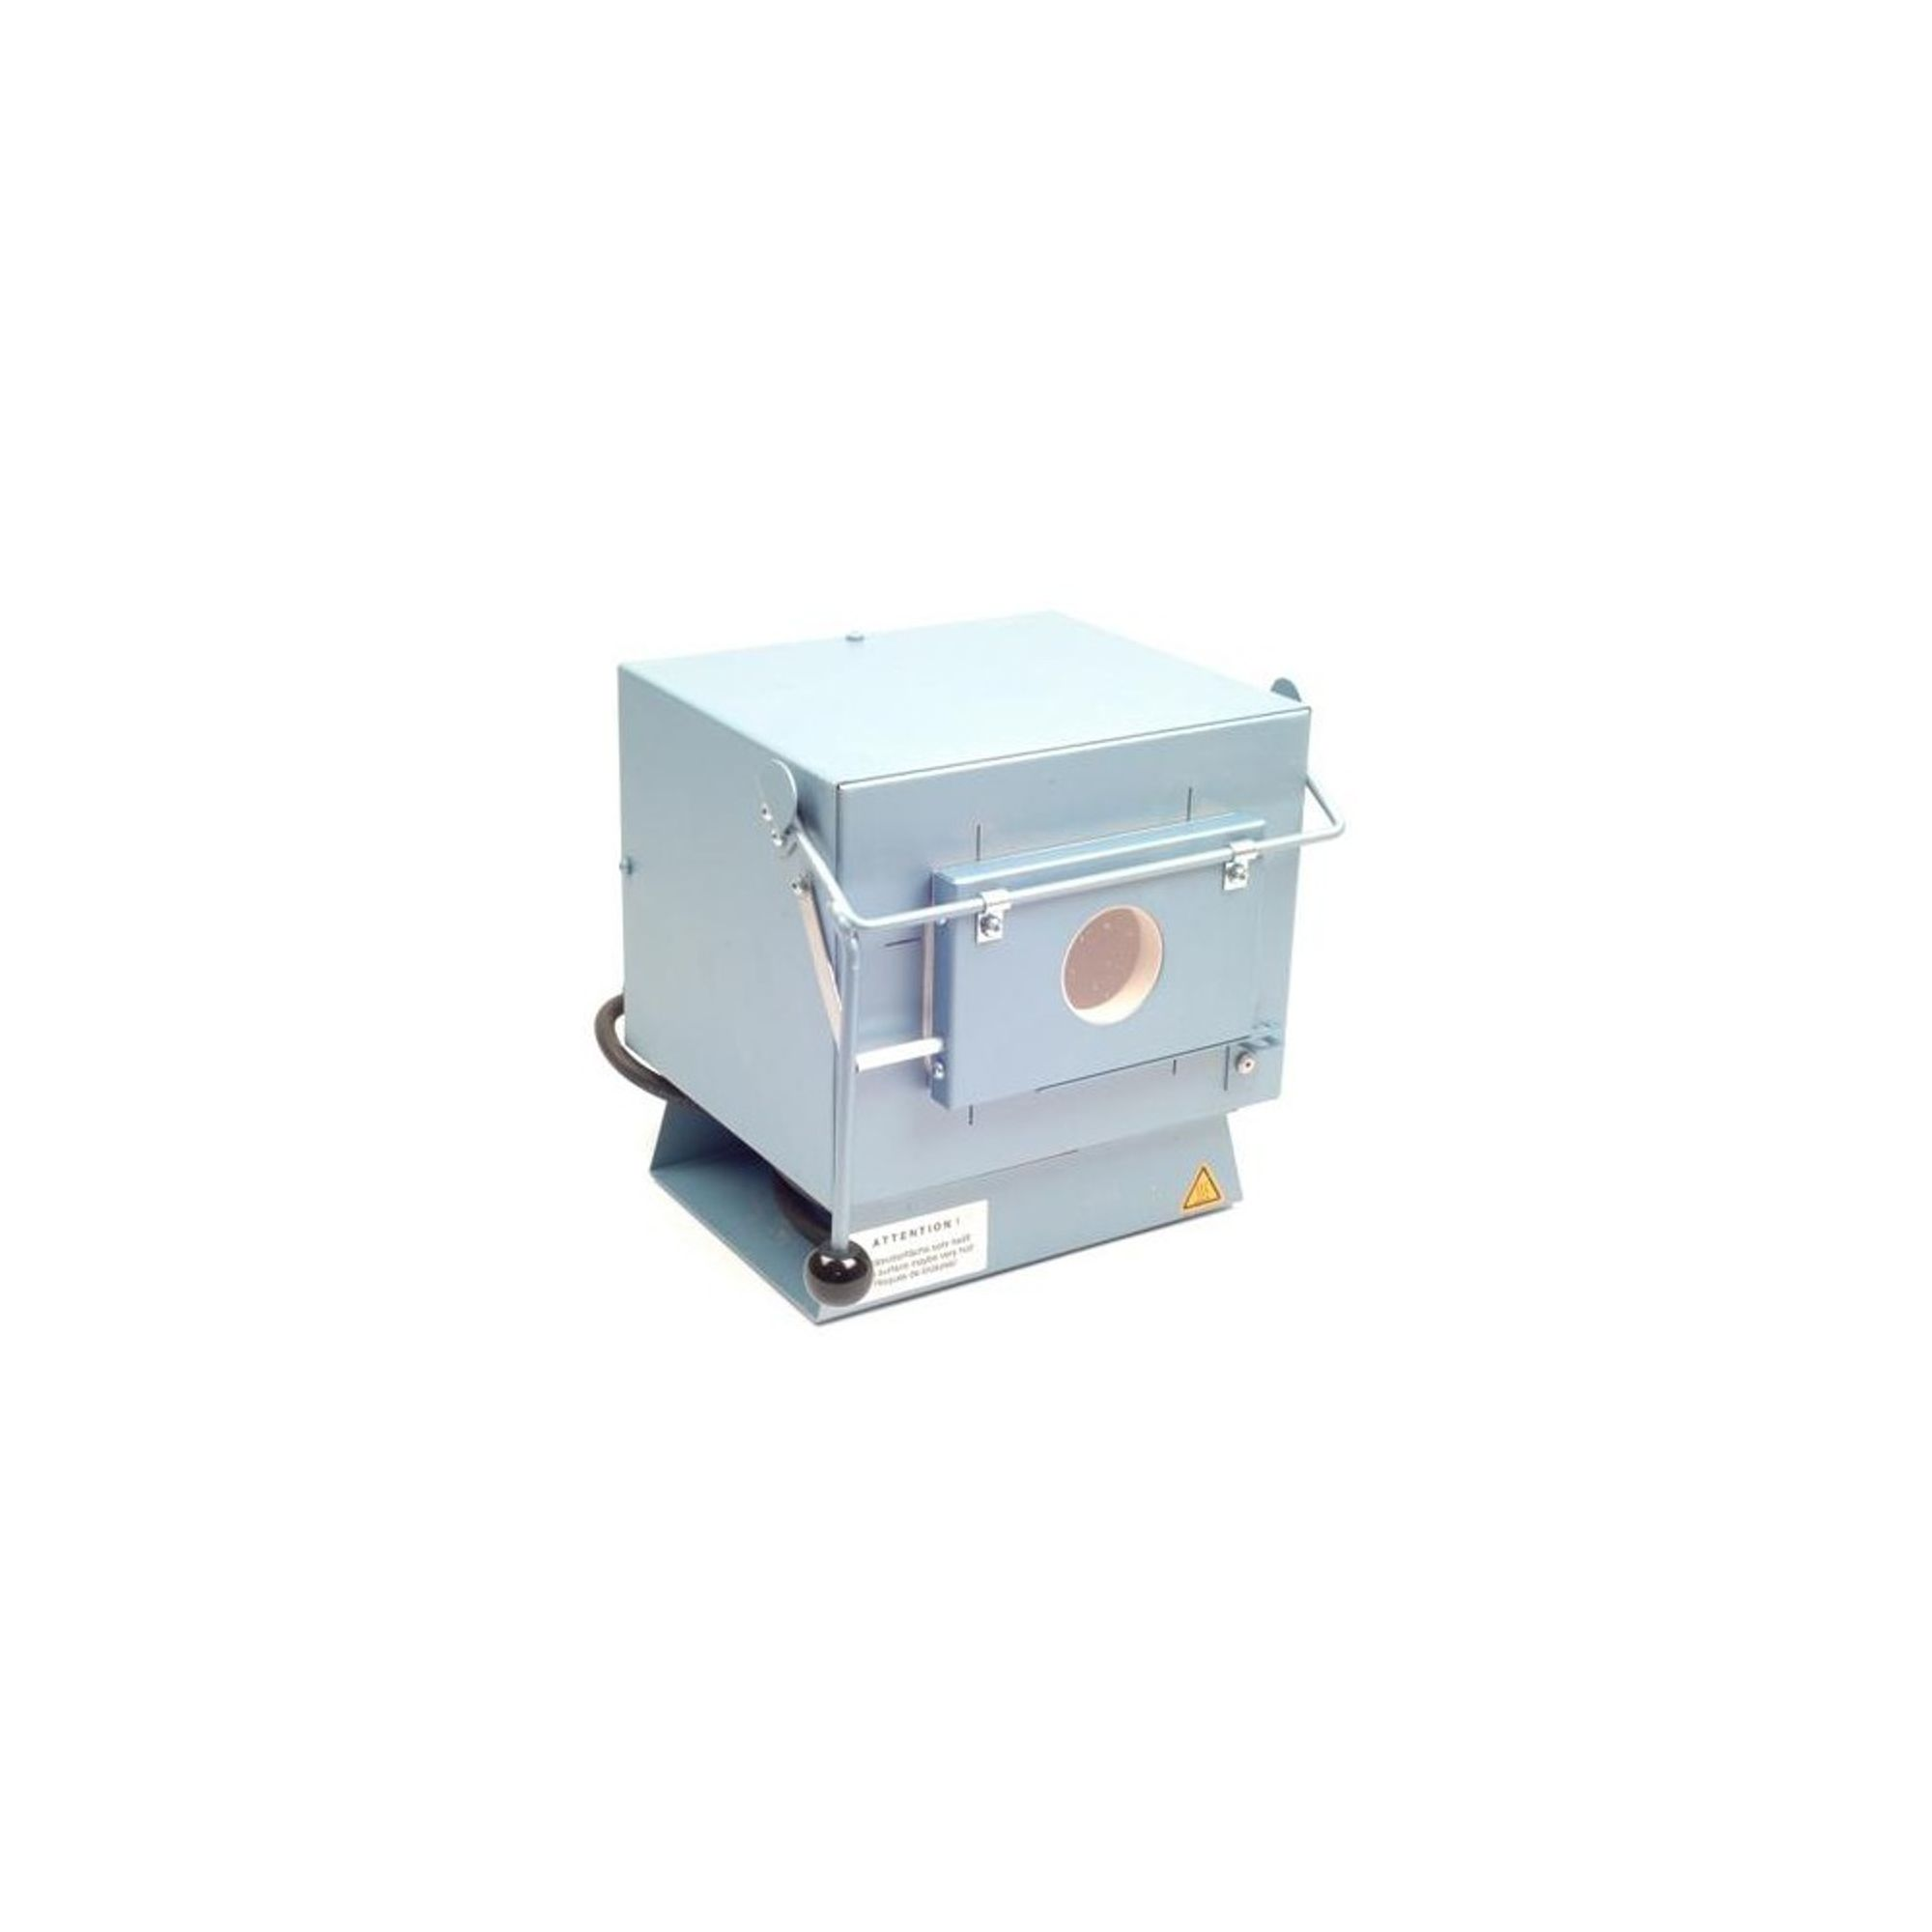 Enamelling Kiln - EFCO 110 at Tesco Direct